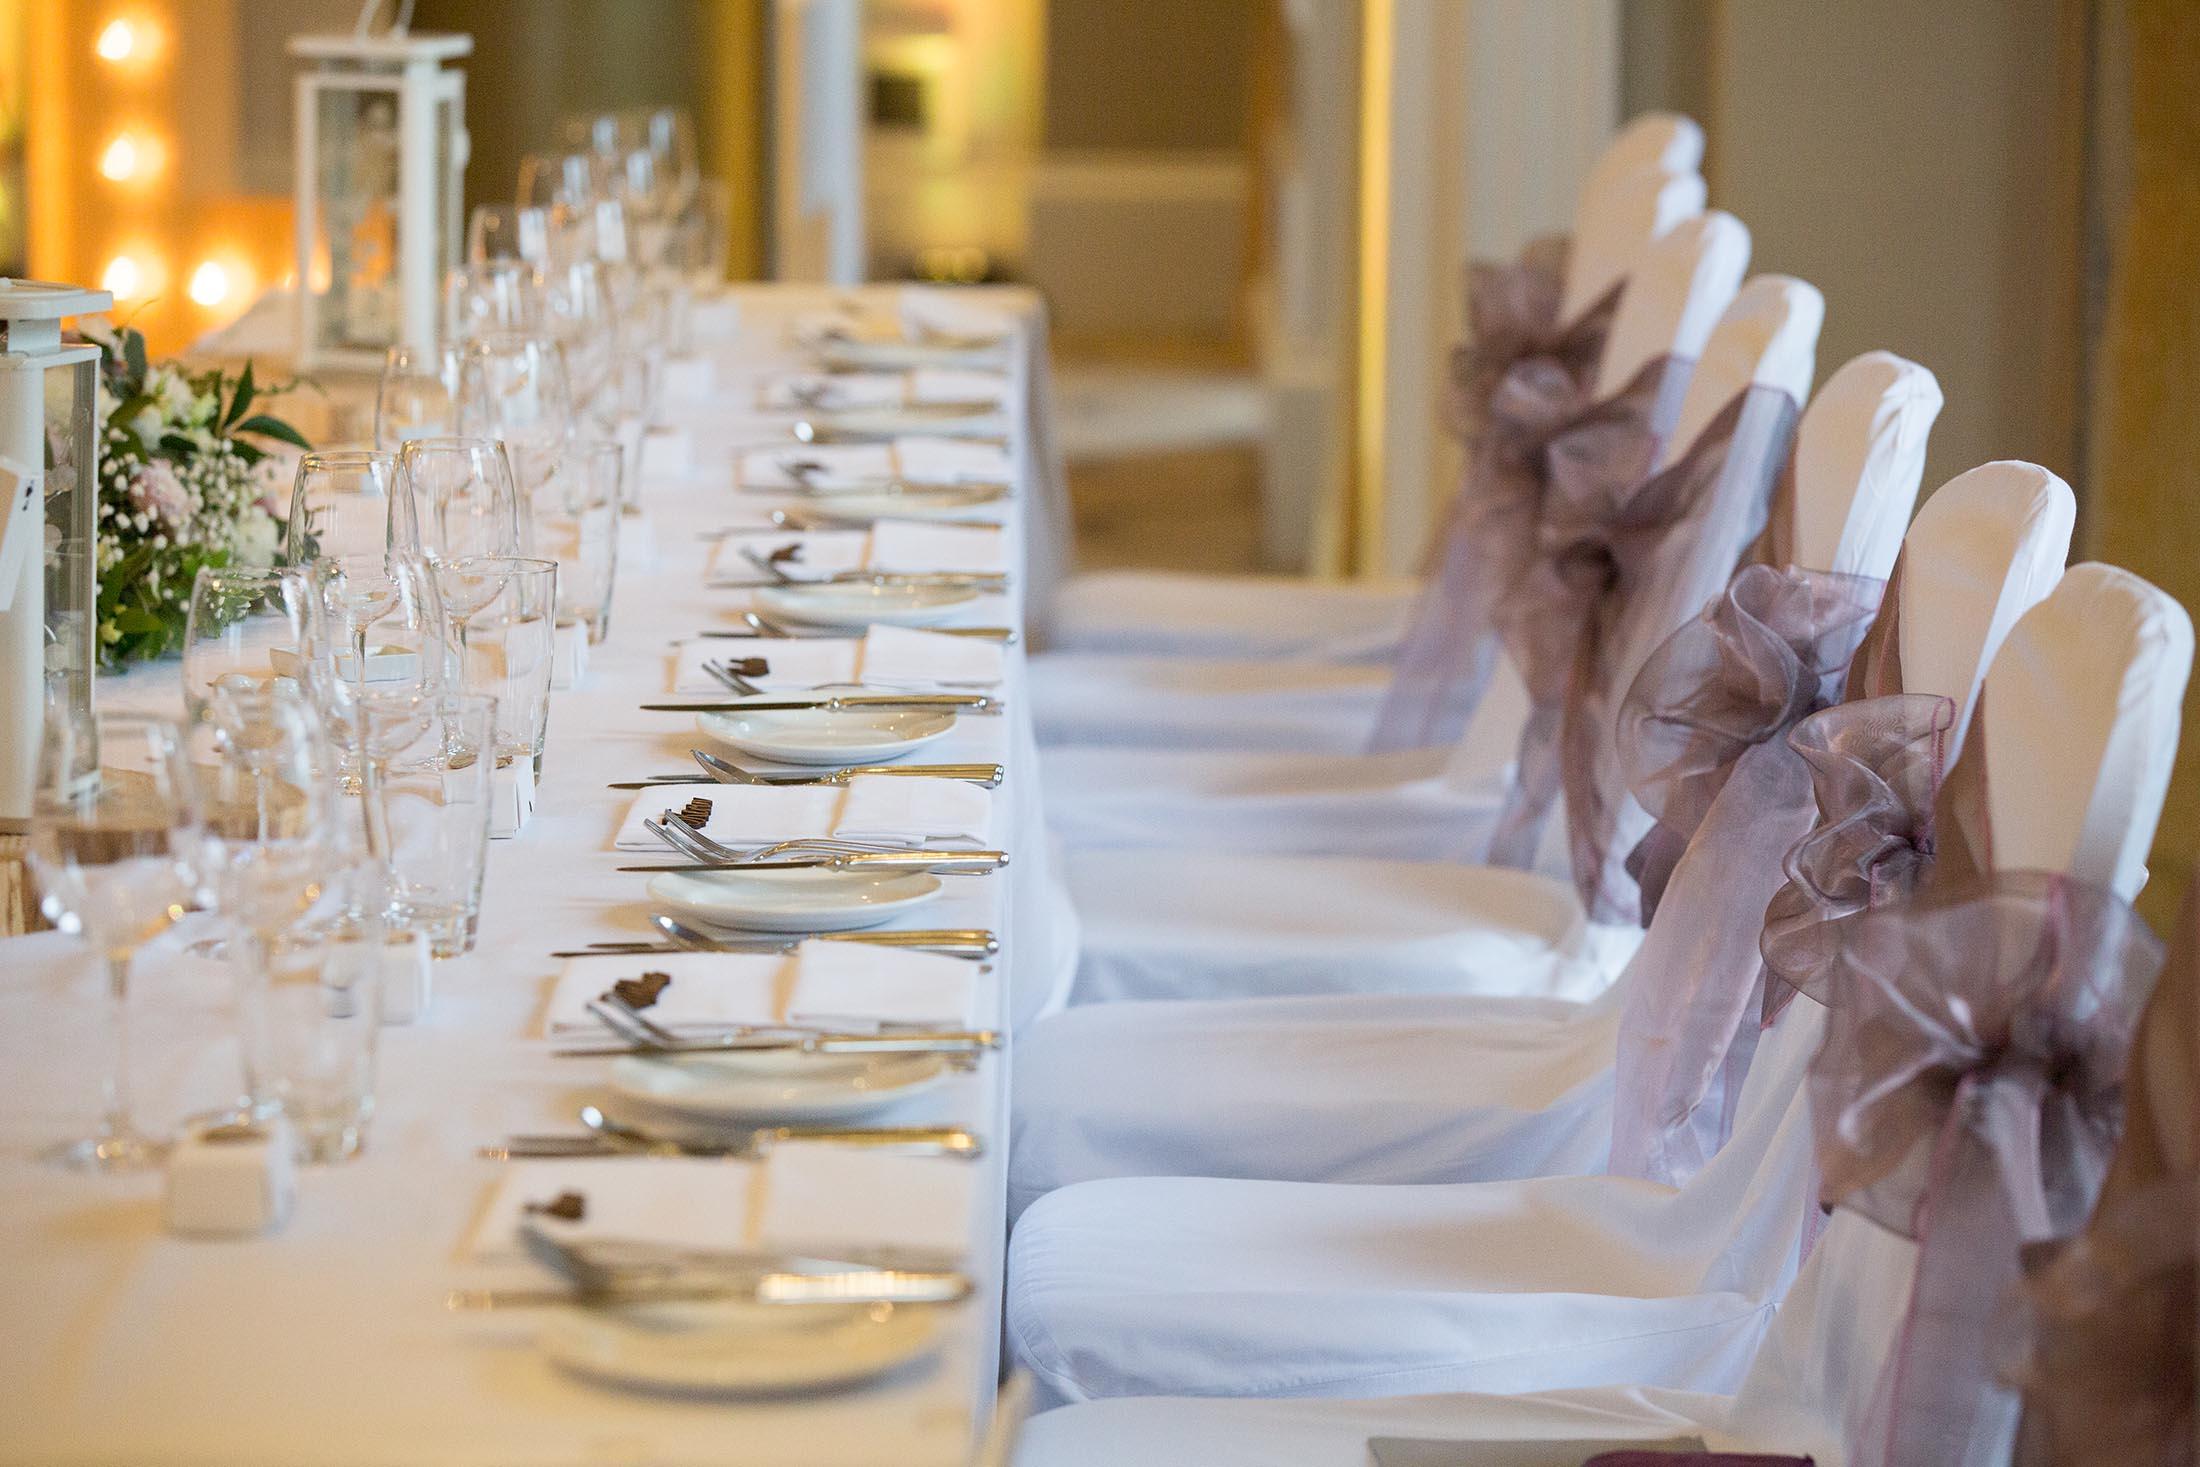 The Wedding Breakfast Room at Rudding Park